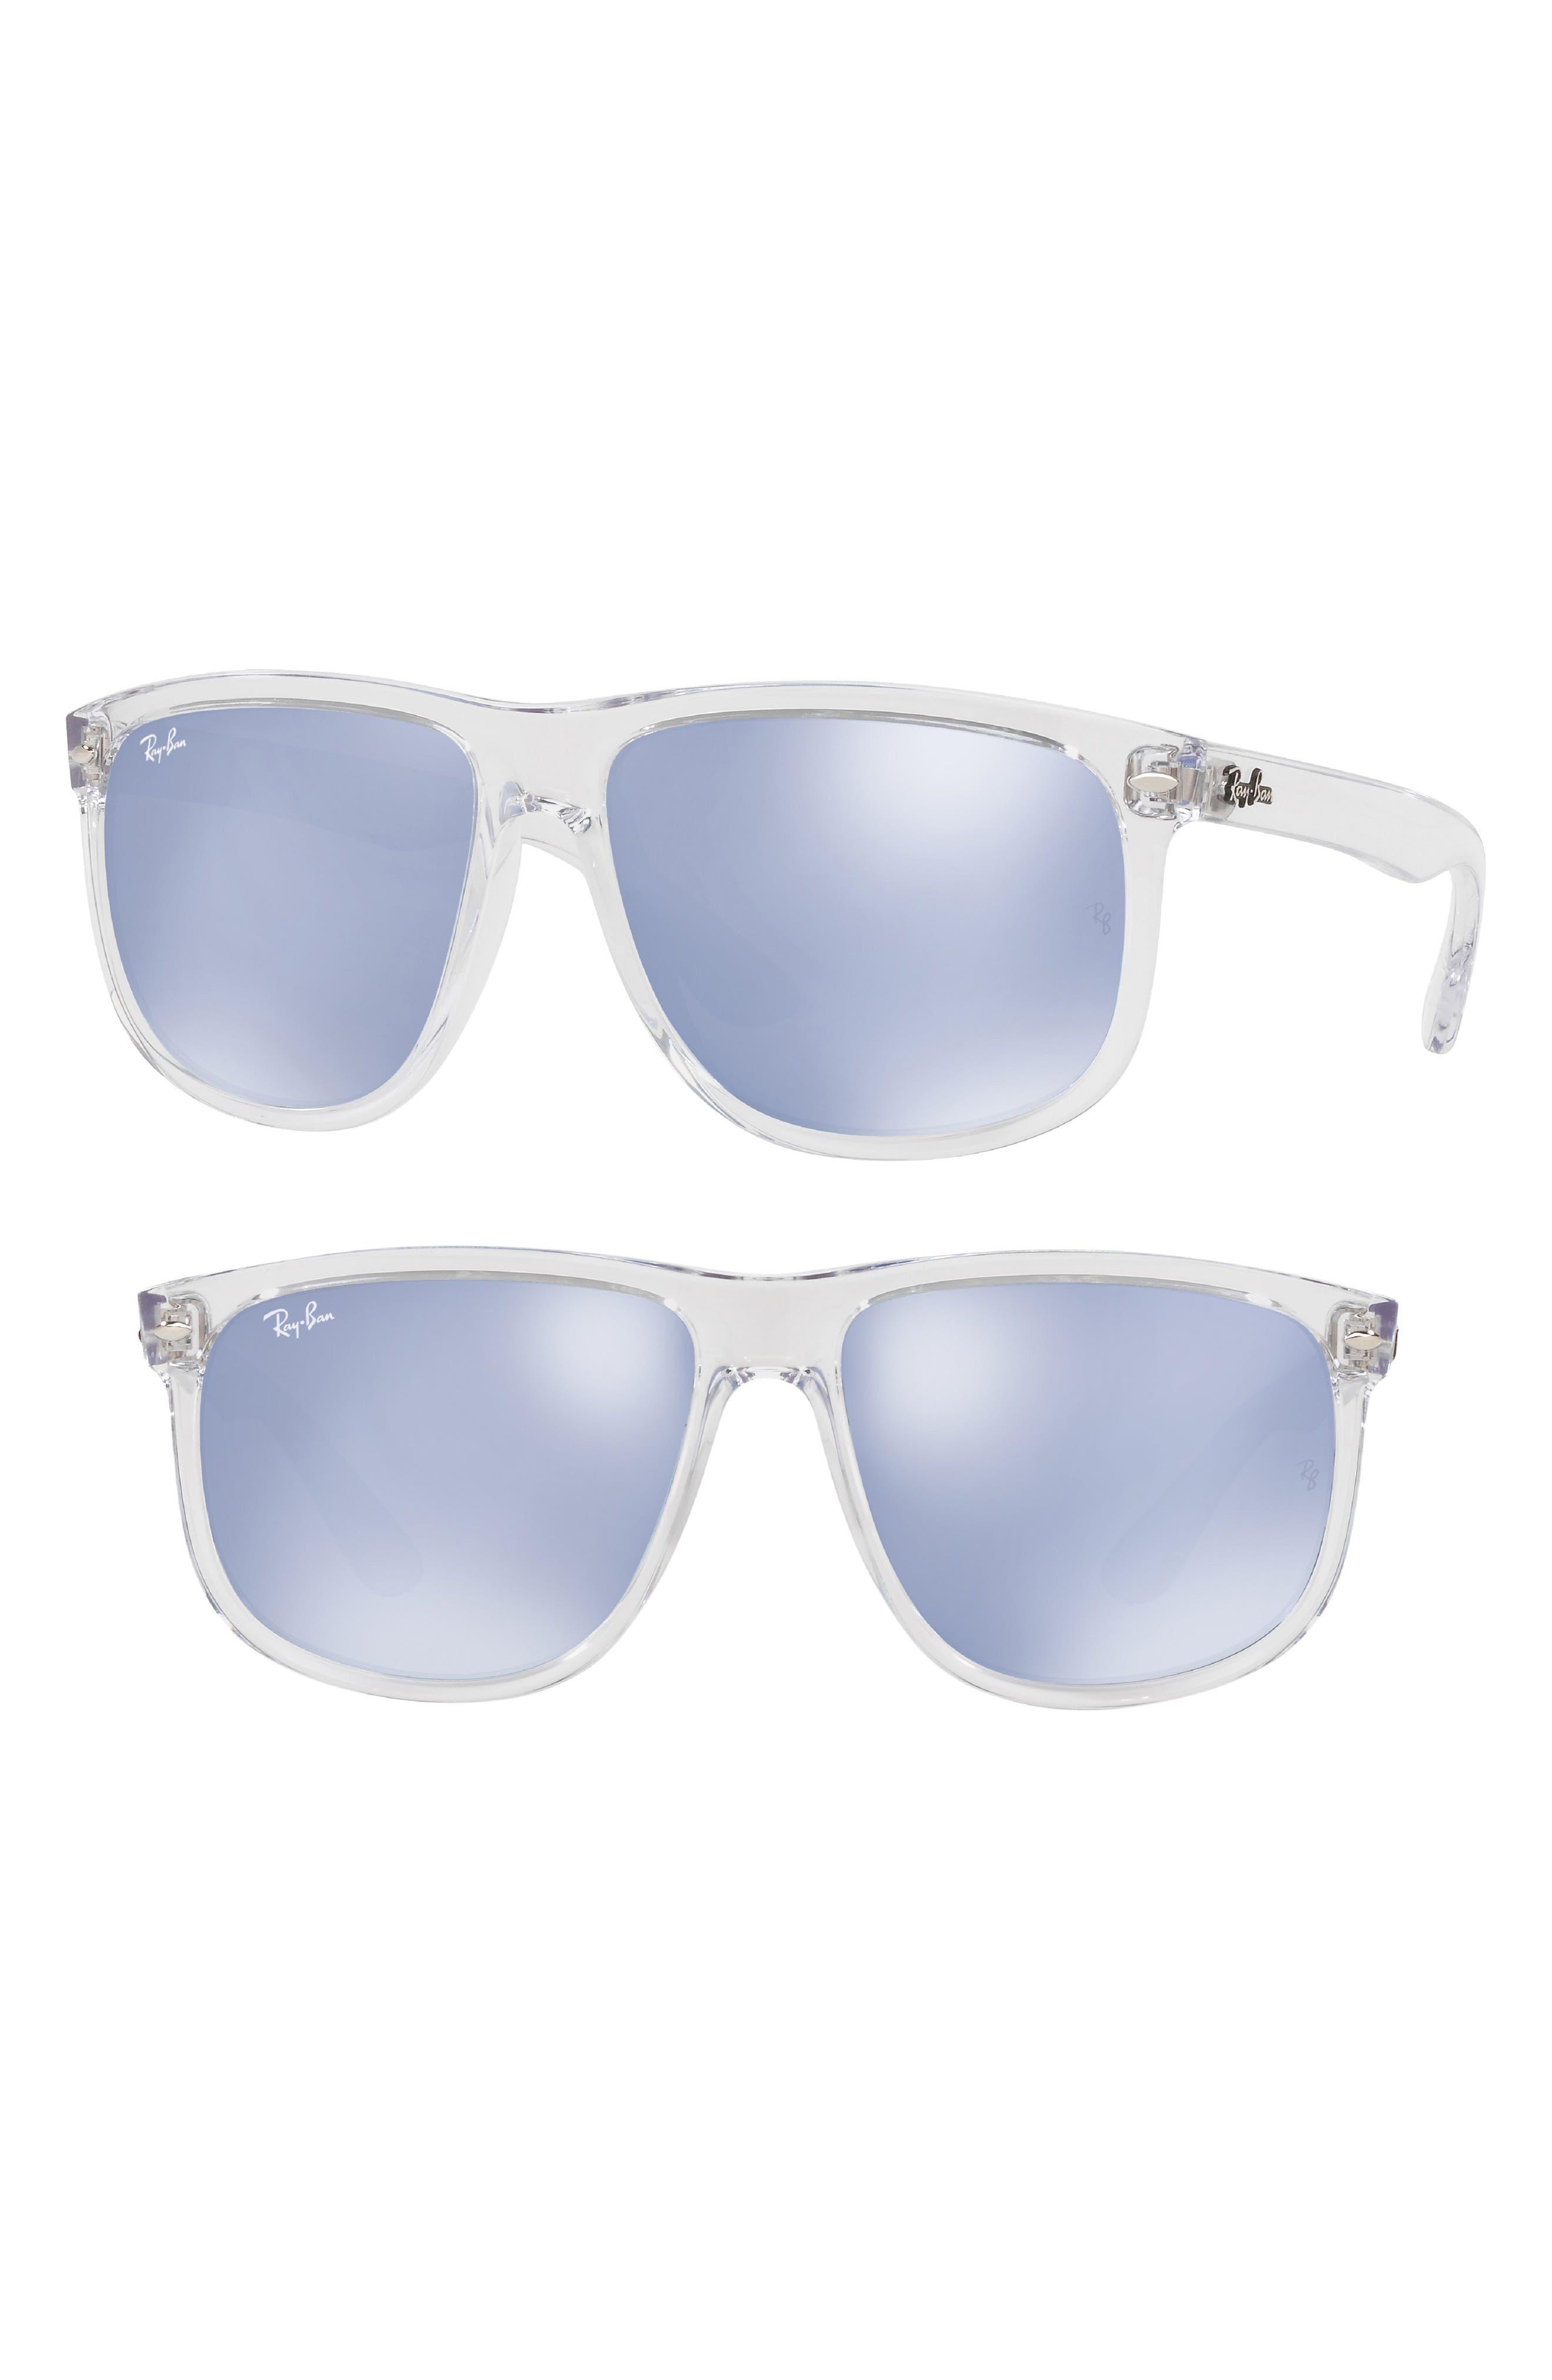 Ray-Ban 60mm Mirrored Sunglasses